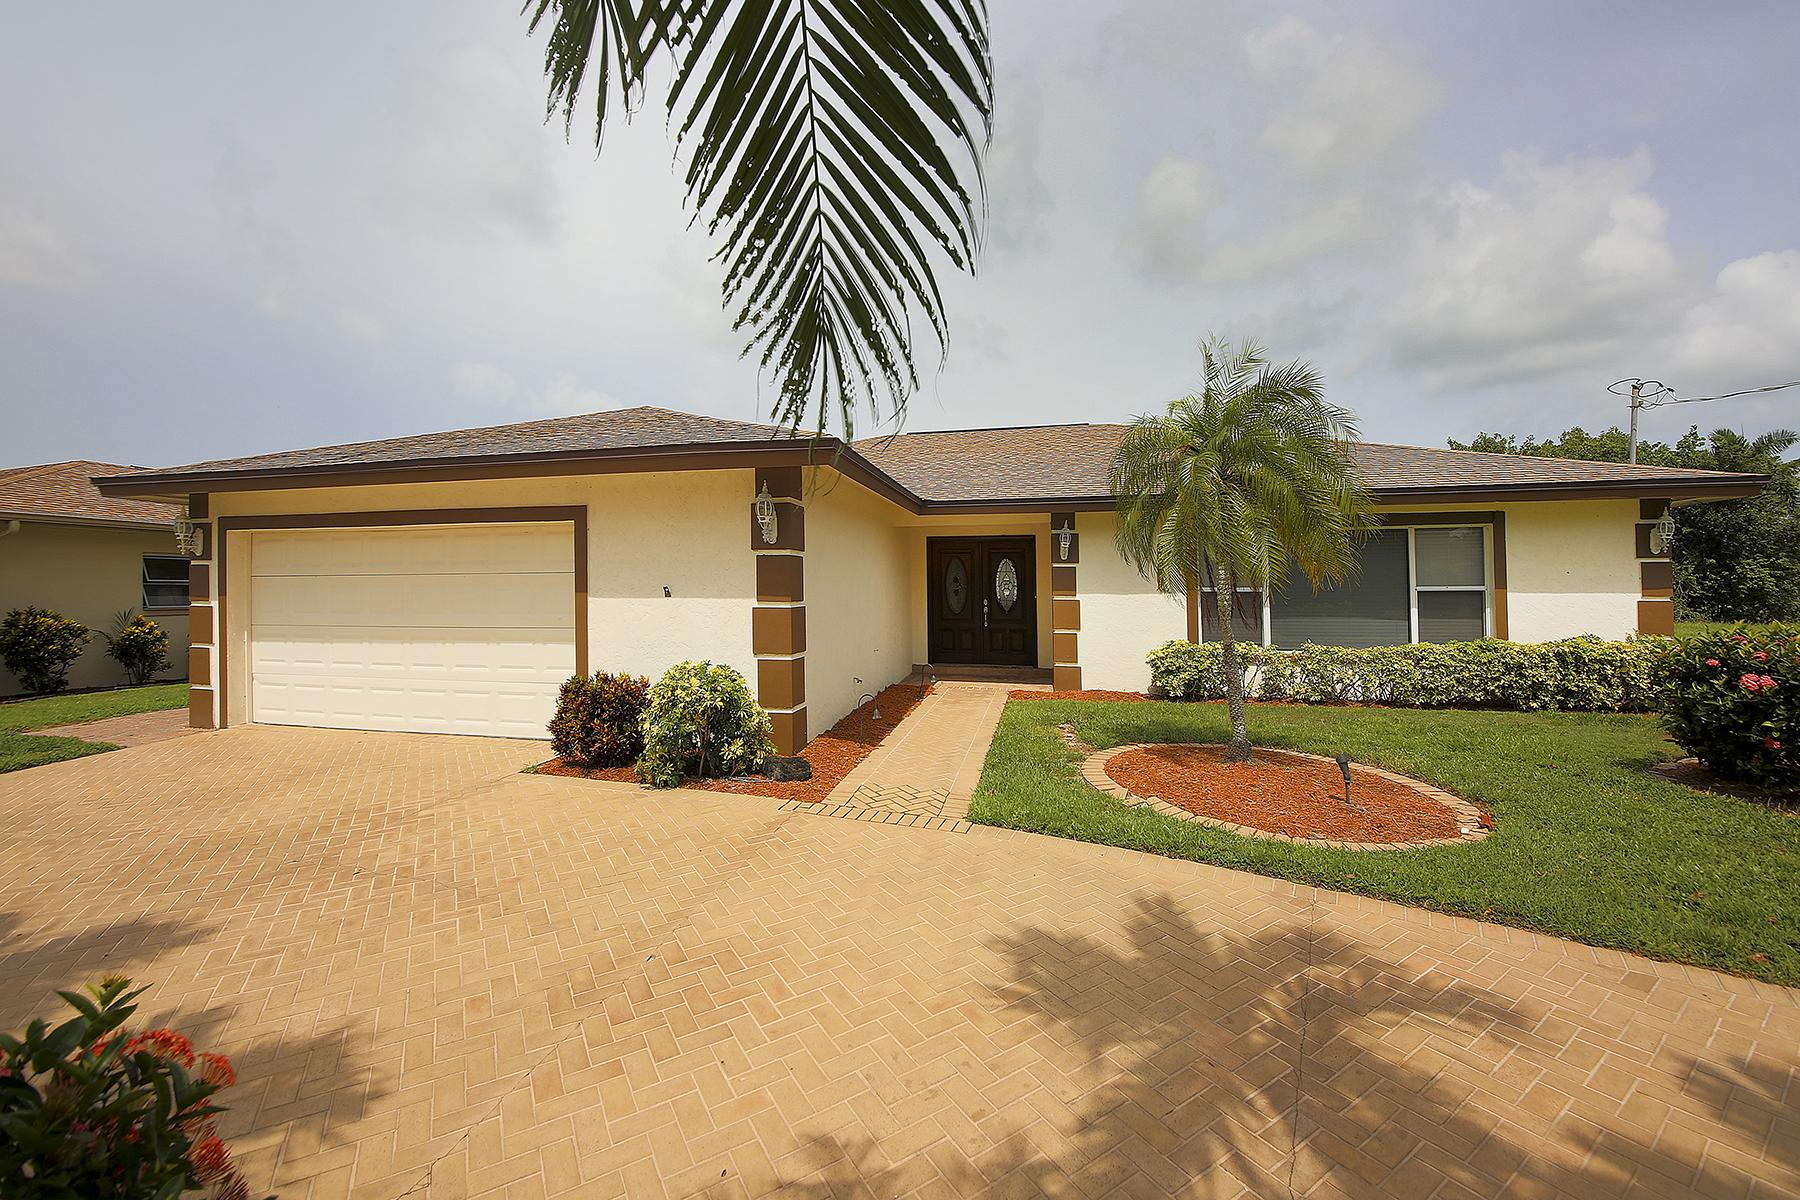 独户住宅 为 销售 在 ISLES OF CAPRI - GRENADA AVE 404 Grenada Ave Naples, 佛罗里达州 34113 美国